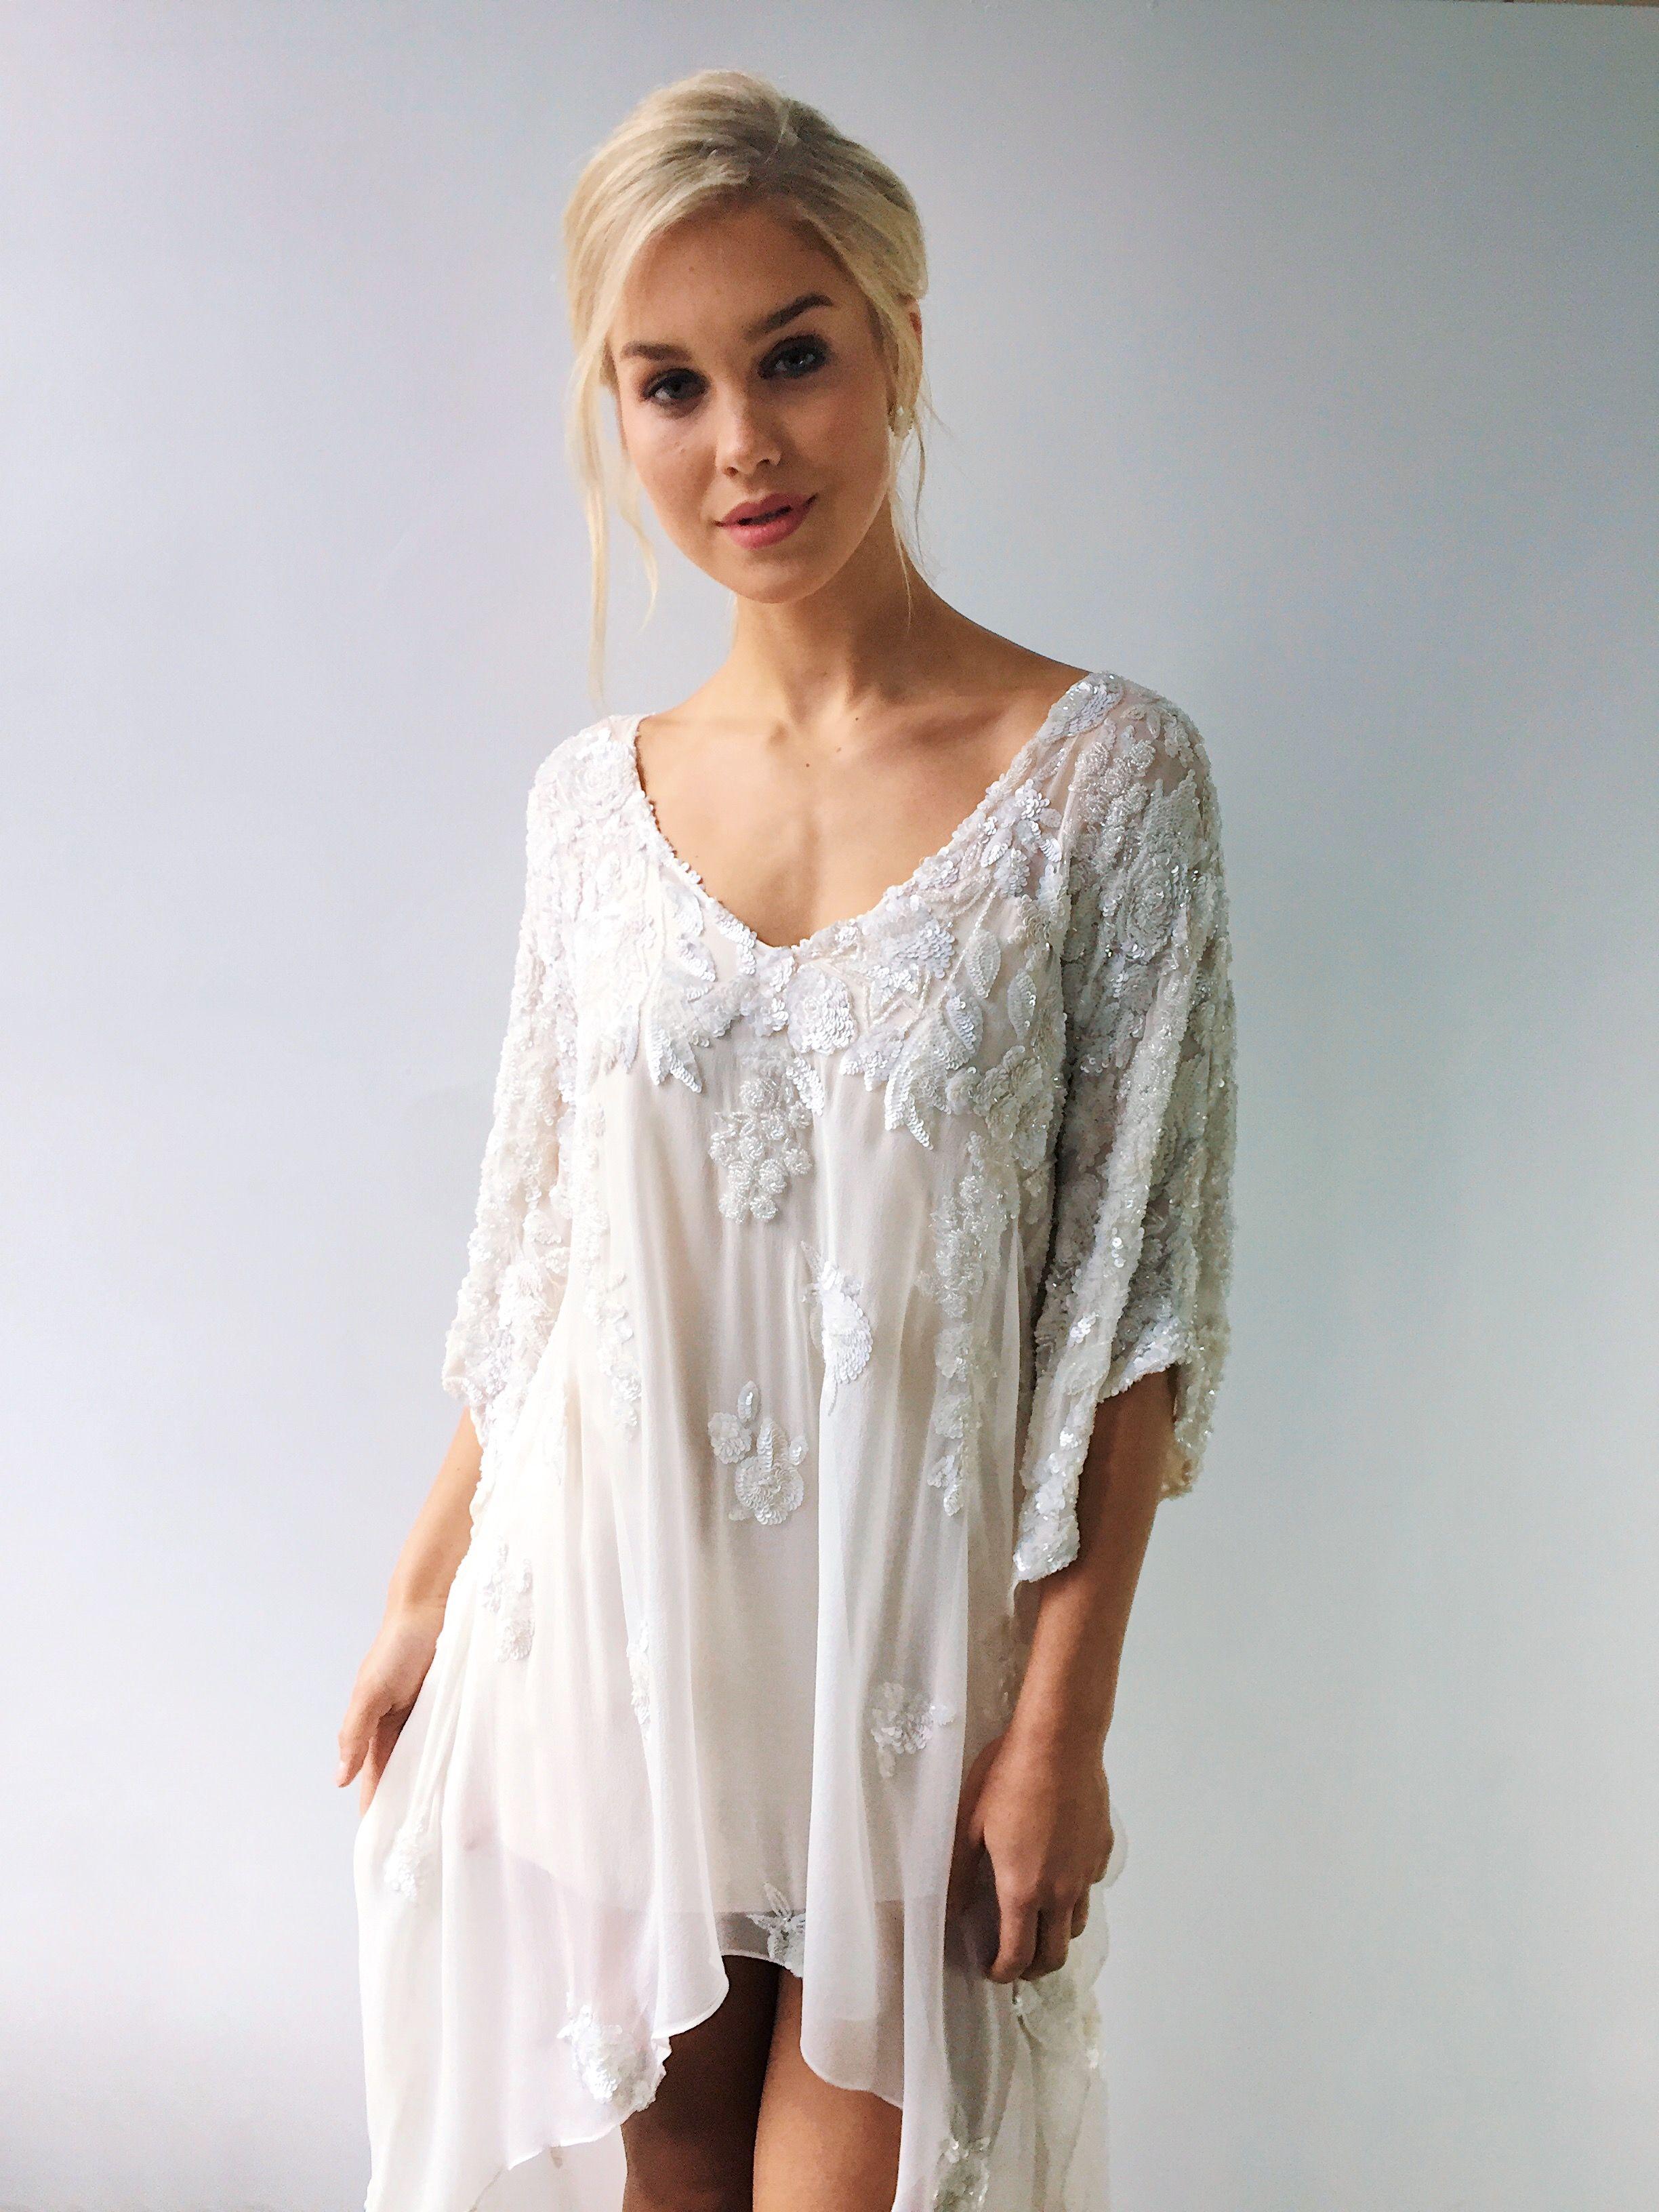 Short white dresses for wedding reception  Cloisters Caftan  WomenMenus fashion  clothes  accessories etc